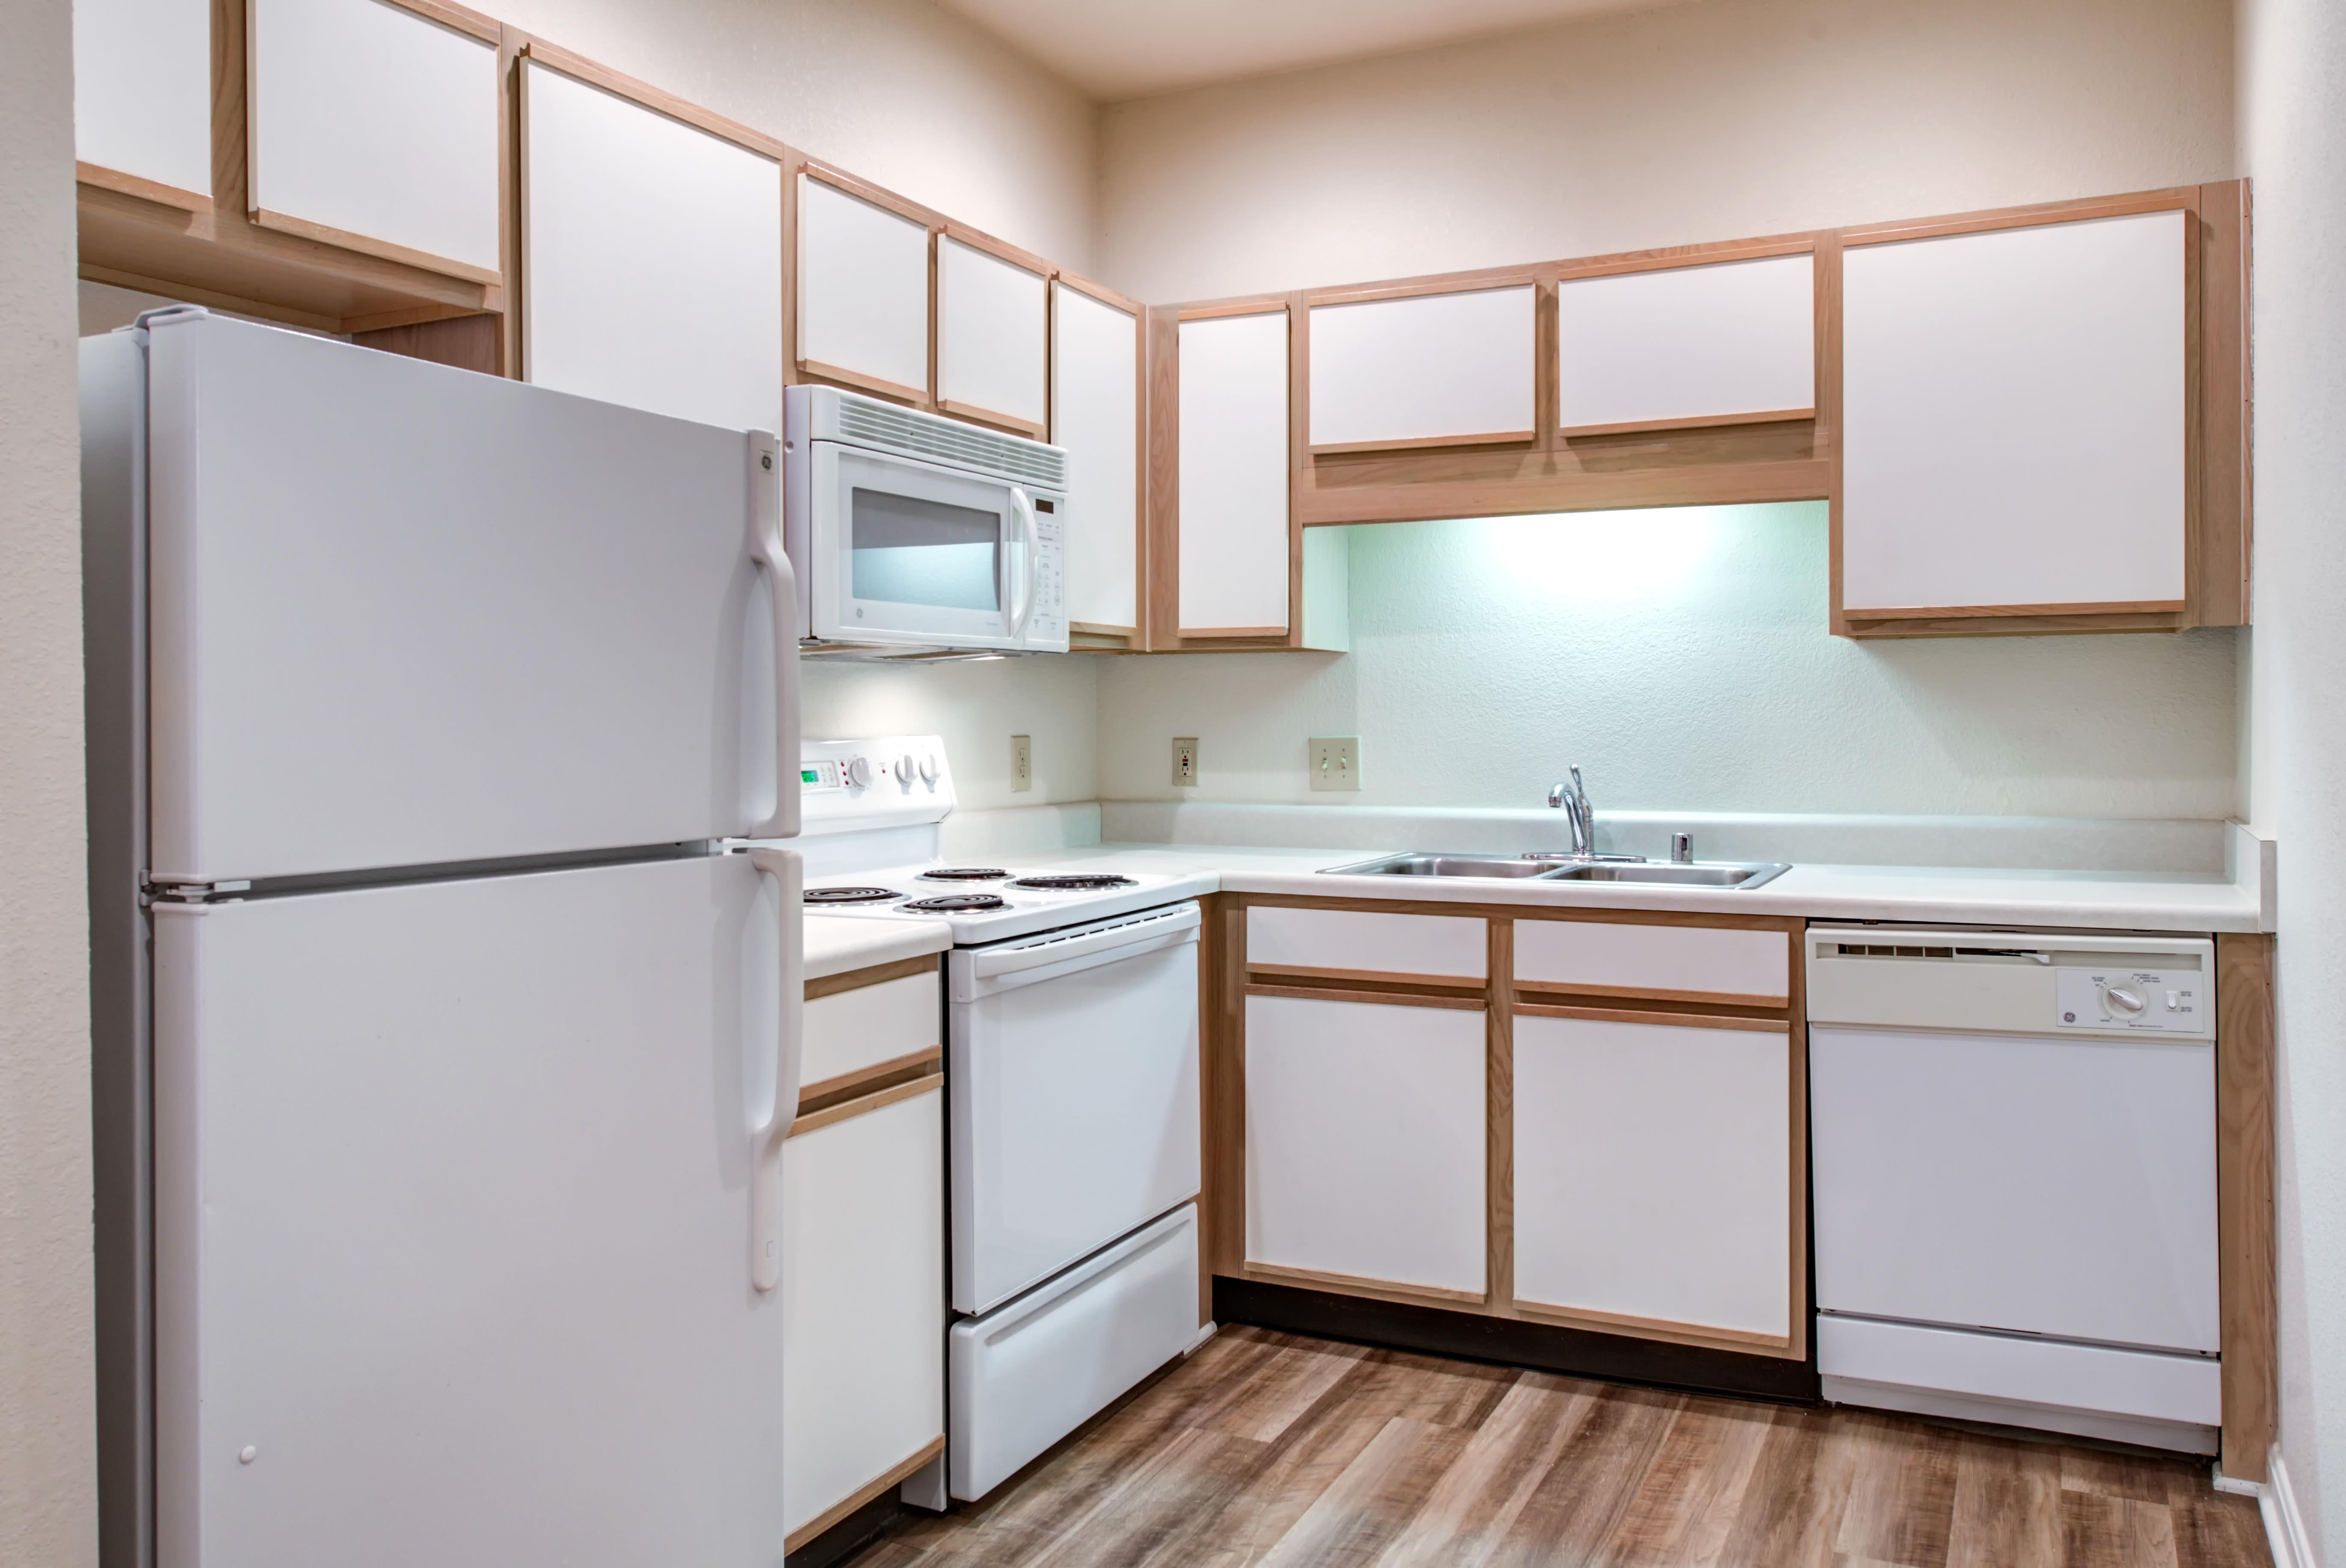 Enjoy our modern apartments kitchen at Renaissance St. Andrews